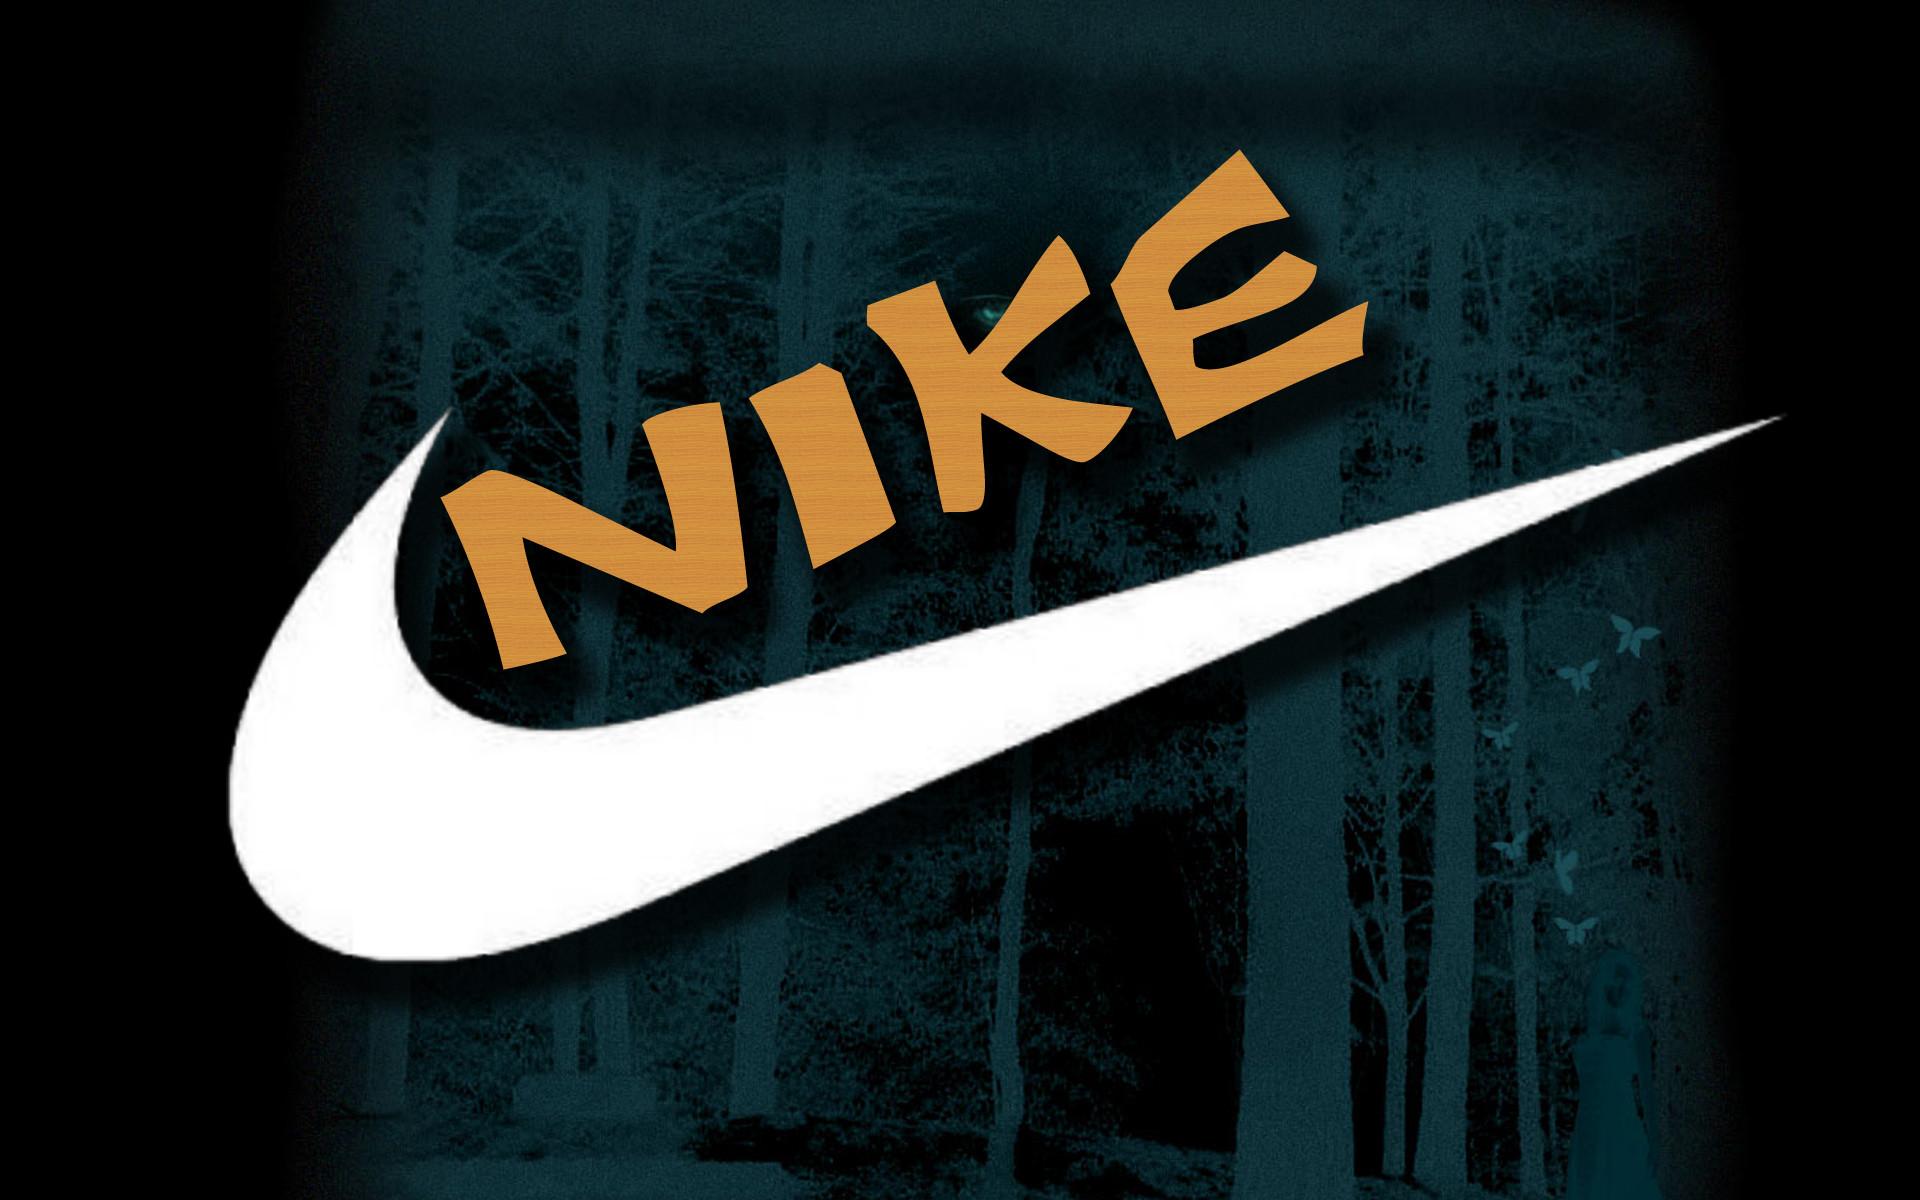 Nike symbol wallpaper 64 images 1080x1920 nike logo new york city wallpaper biocorpaavc